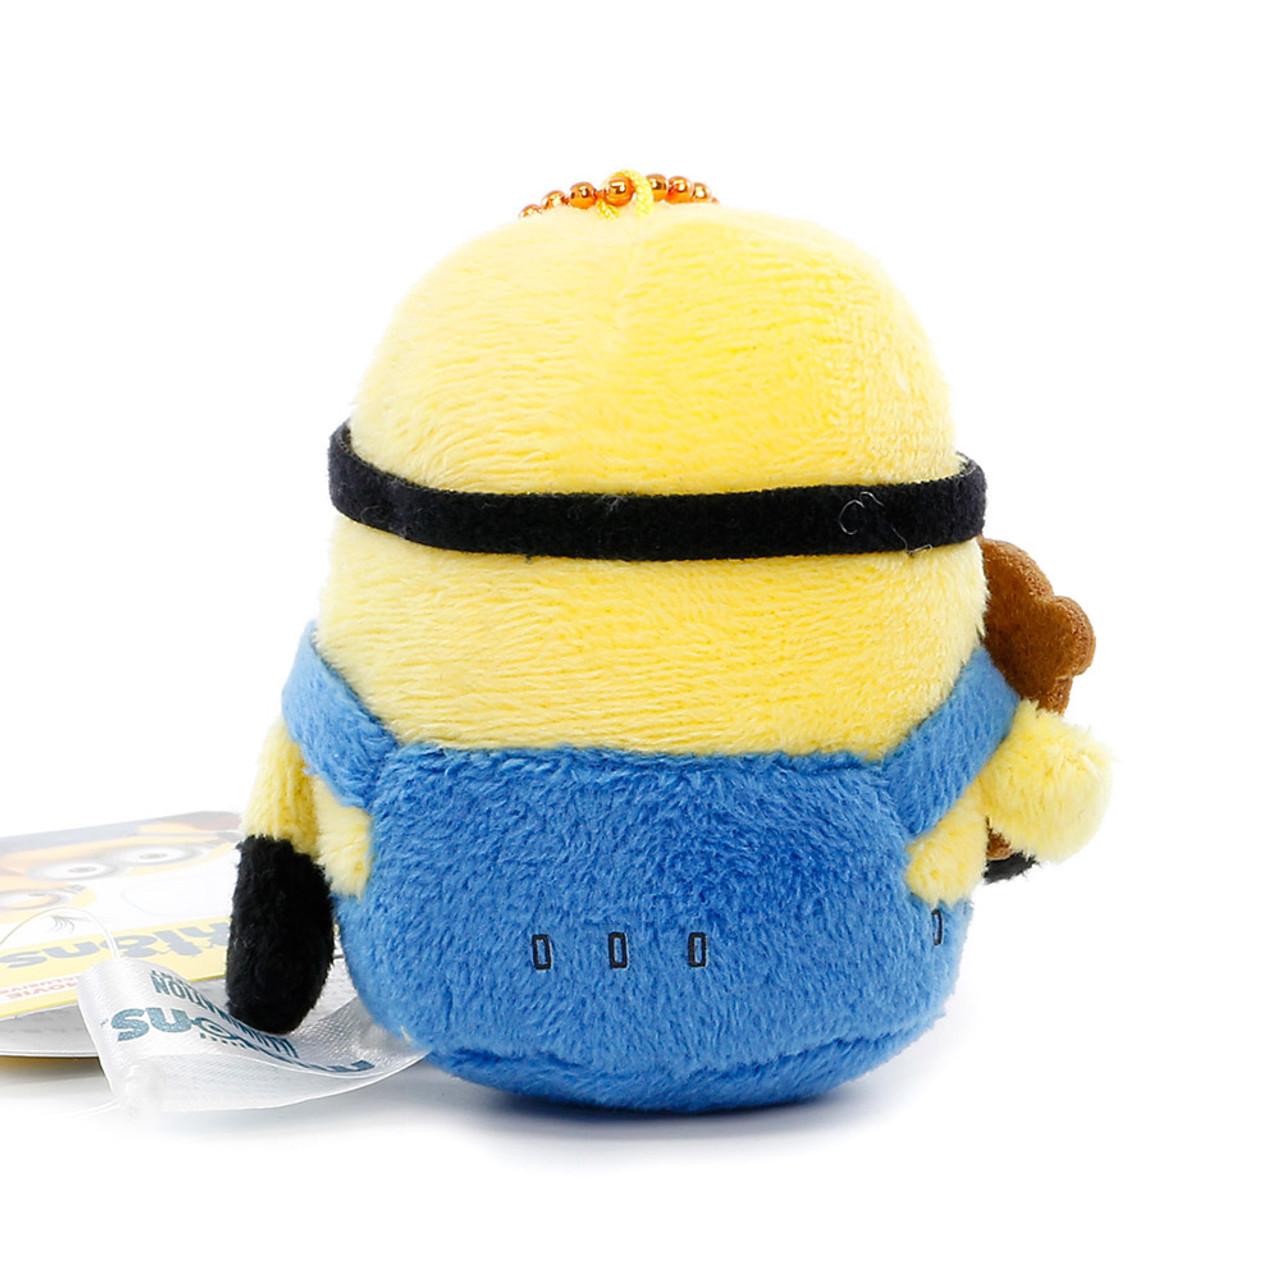 Bob The Minions Mascot Plush Keychain ( Back View )